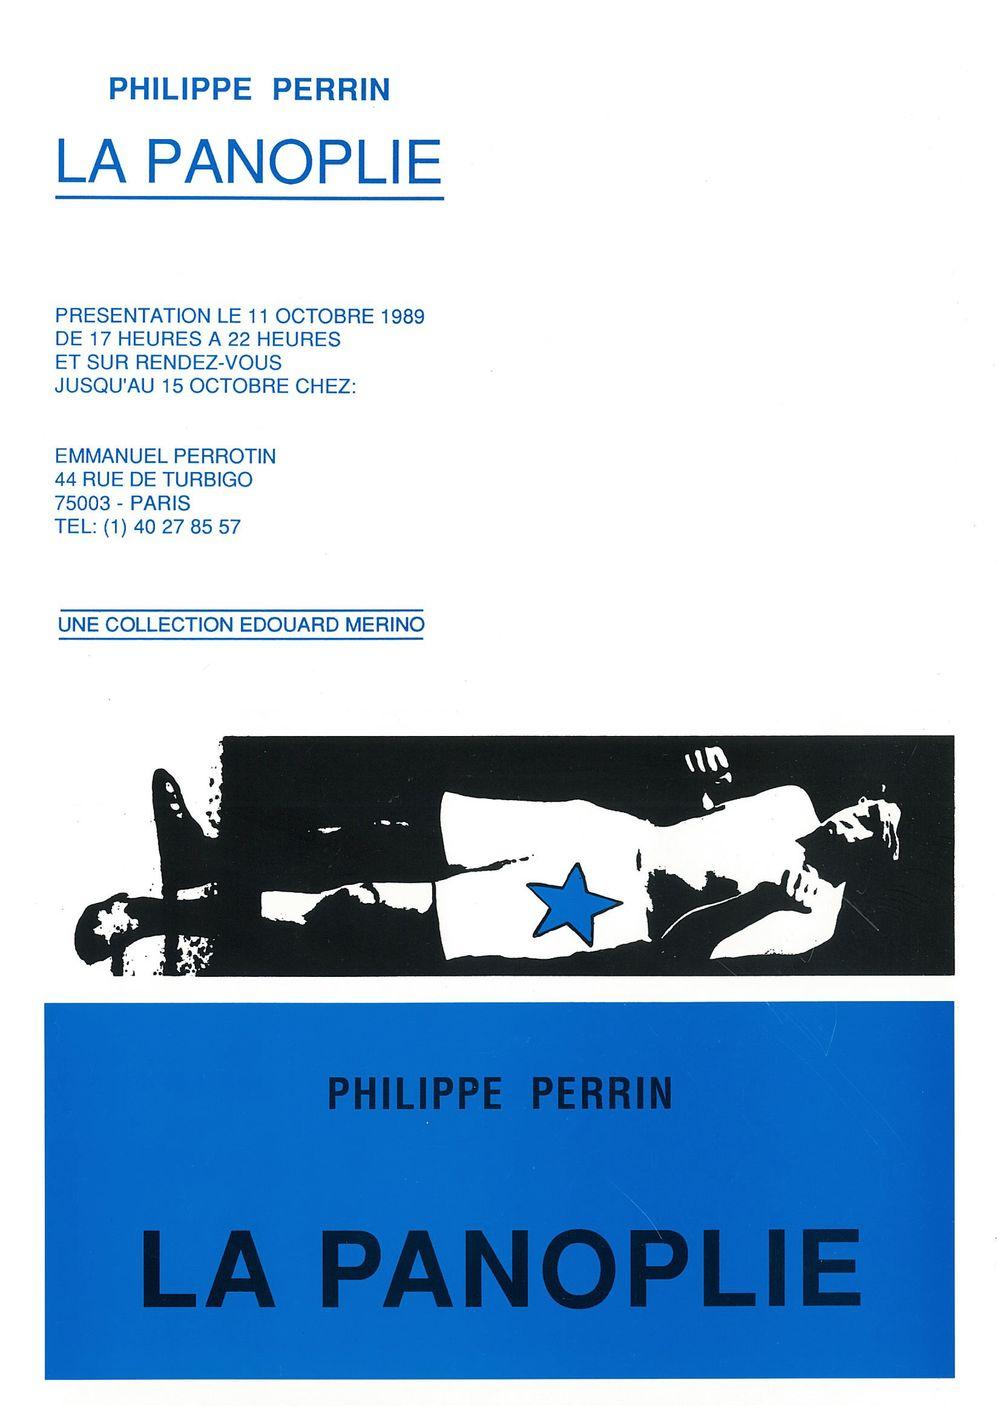 Artist:Philippe PERRIN, Exhibition:La panoplie